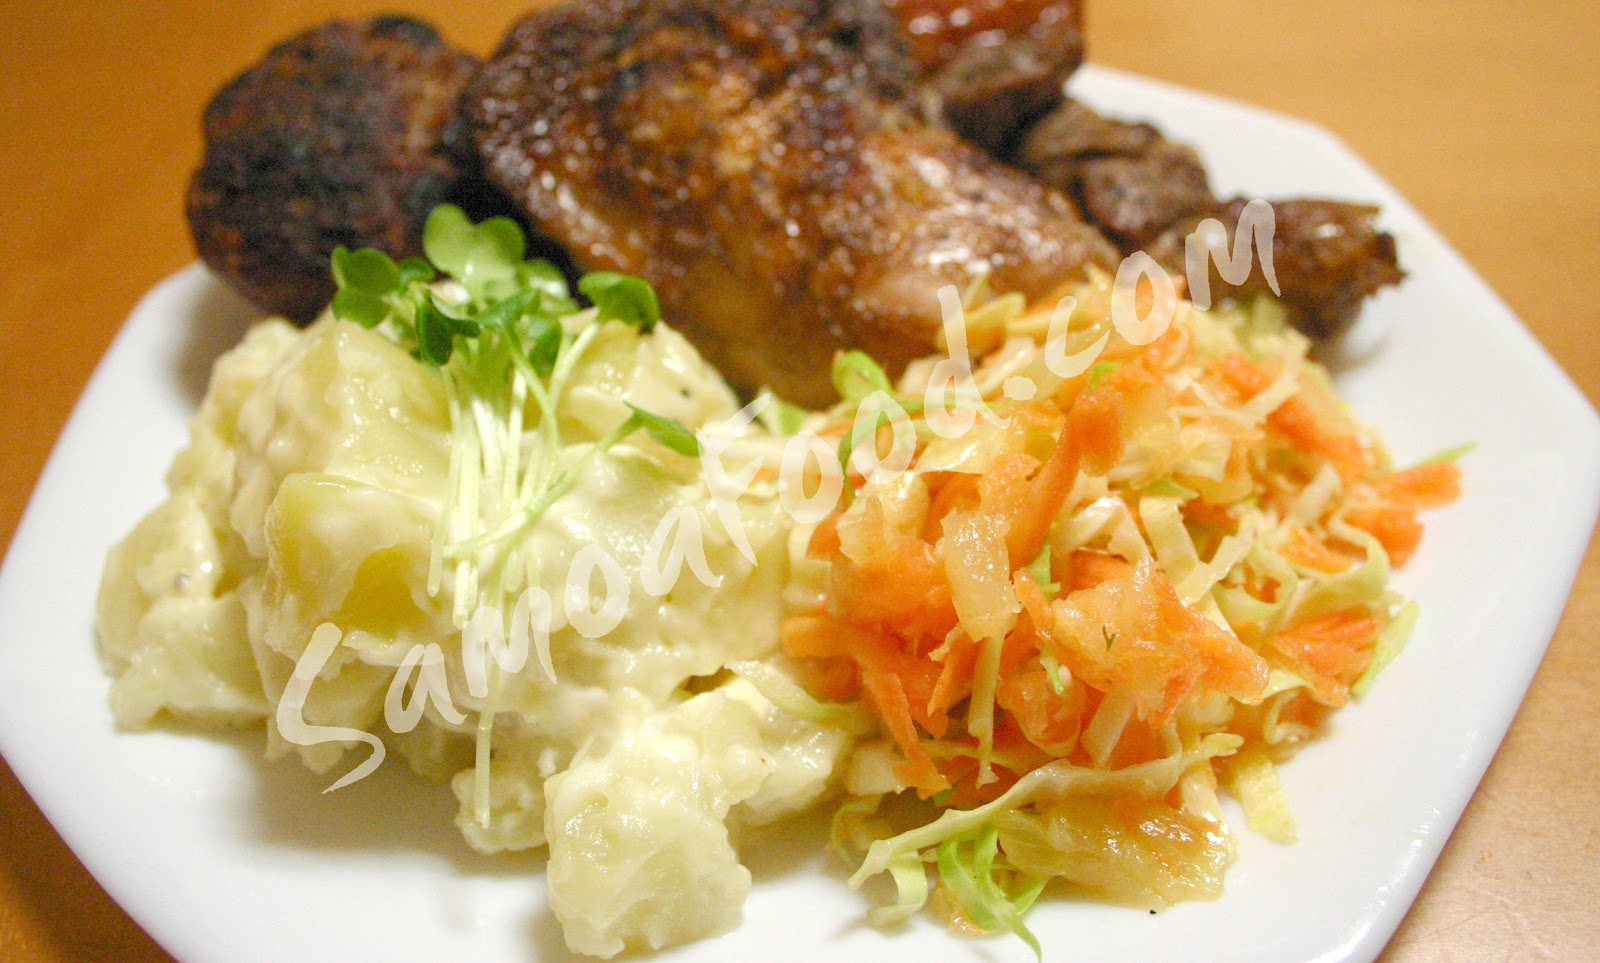 Samoa Food: Samoa Divided and BBQ side dishes